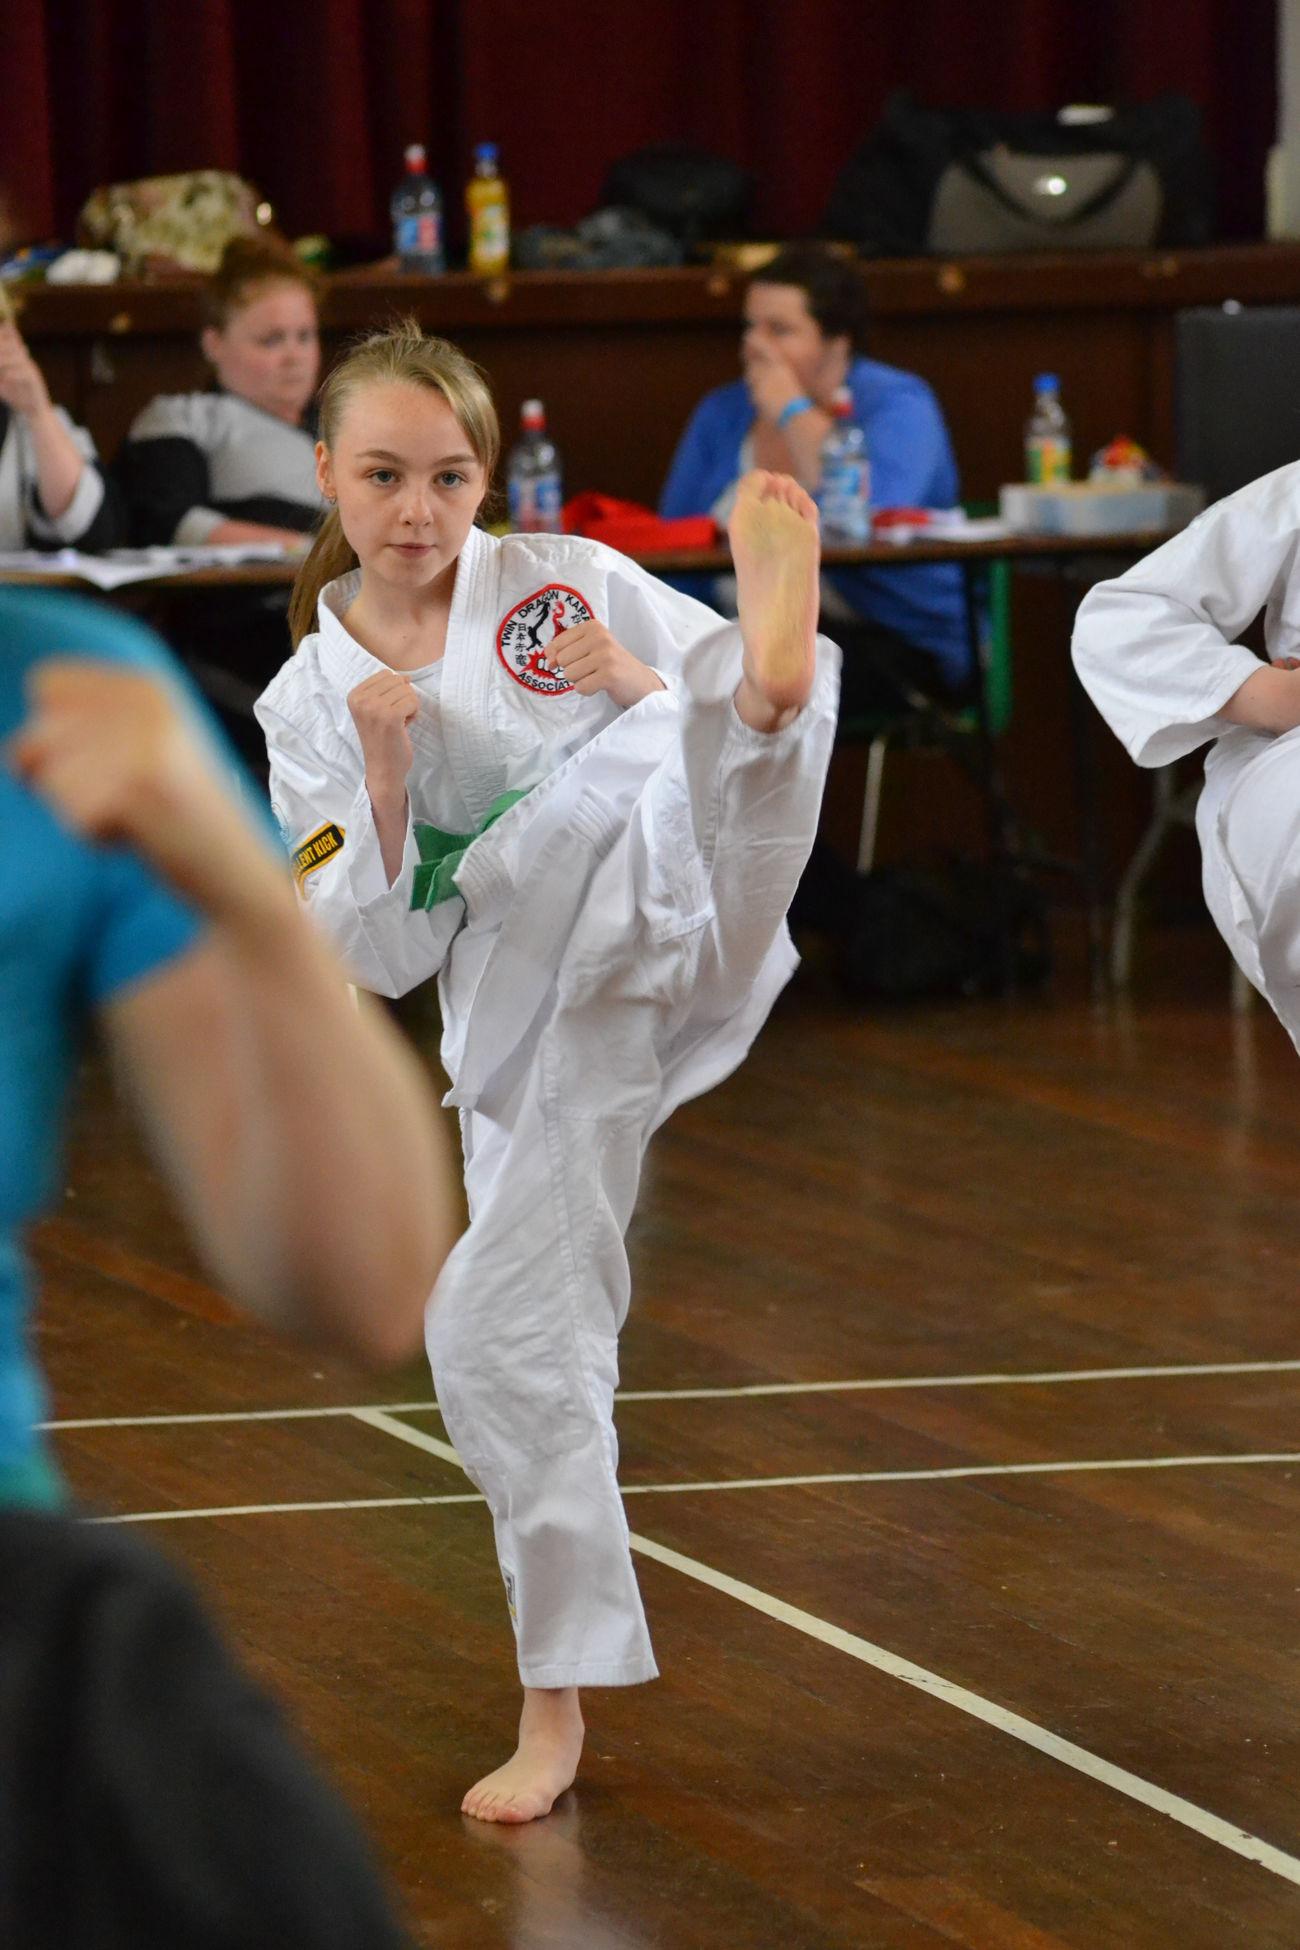 Daughter Kids Children Wado-ryu Karate Kickboxing Aïkido Sport Sports Photography